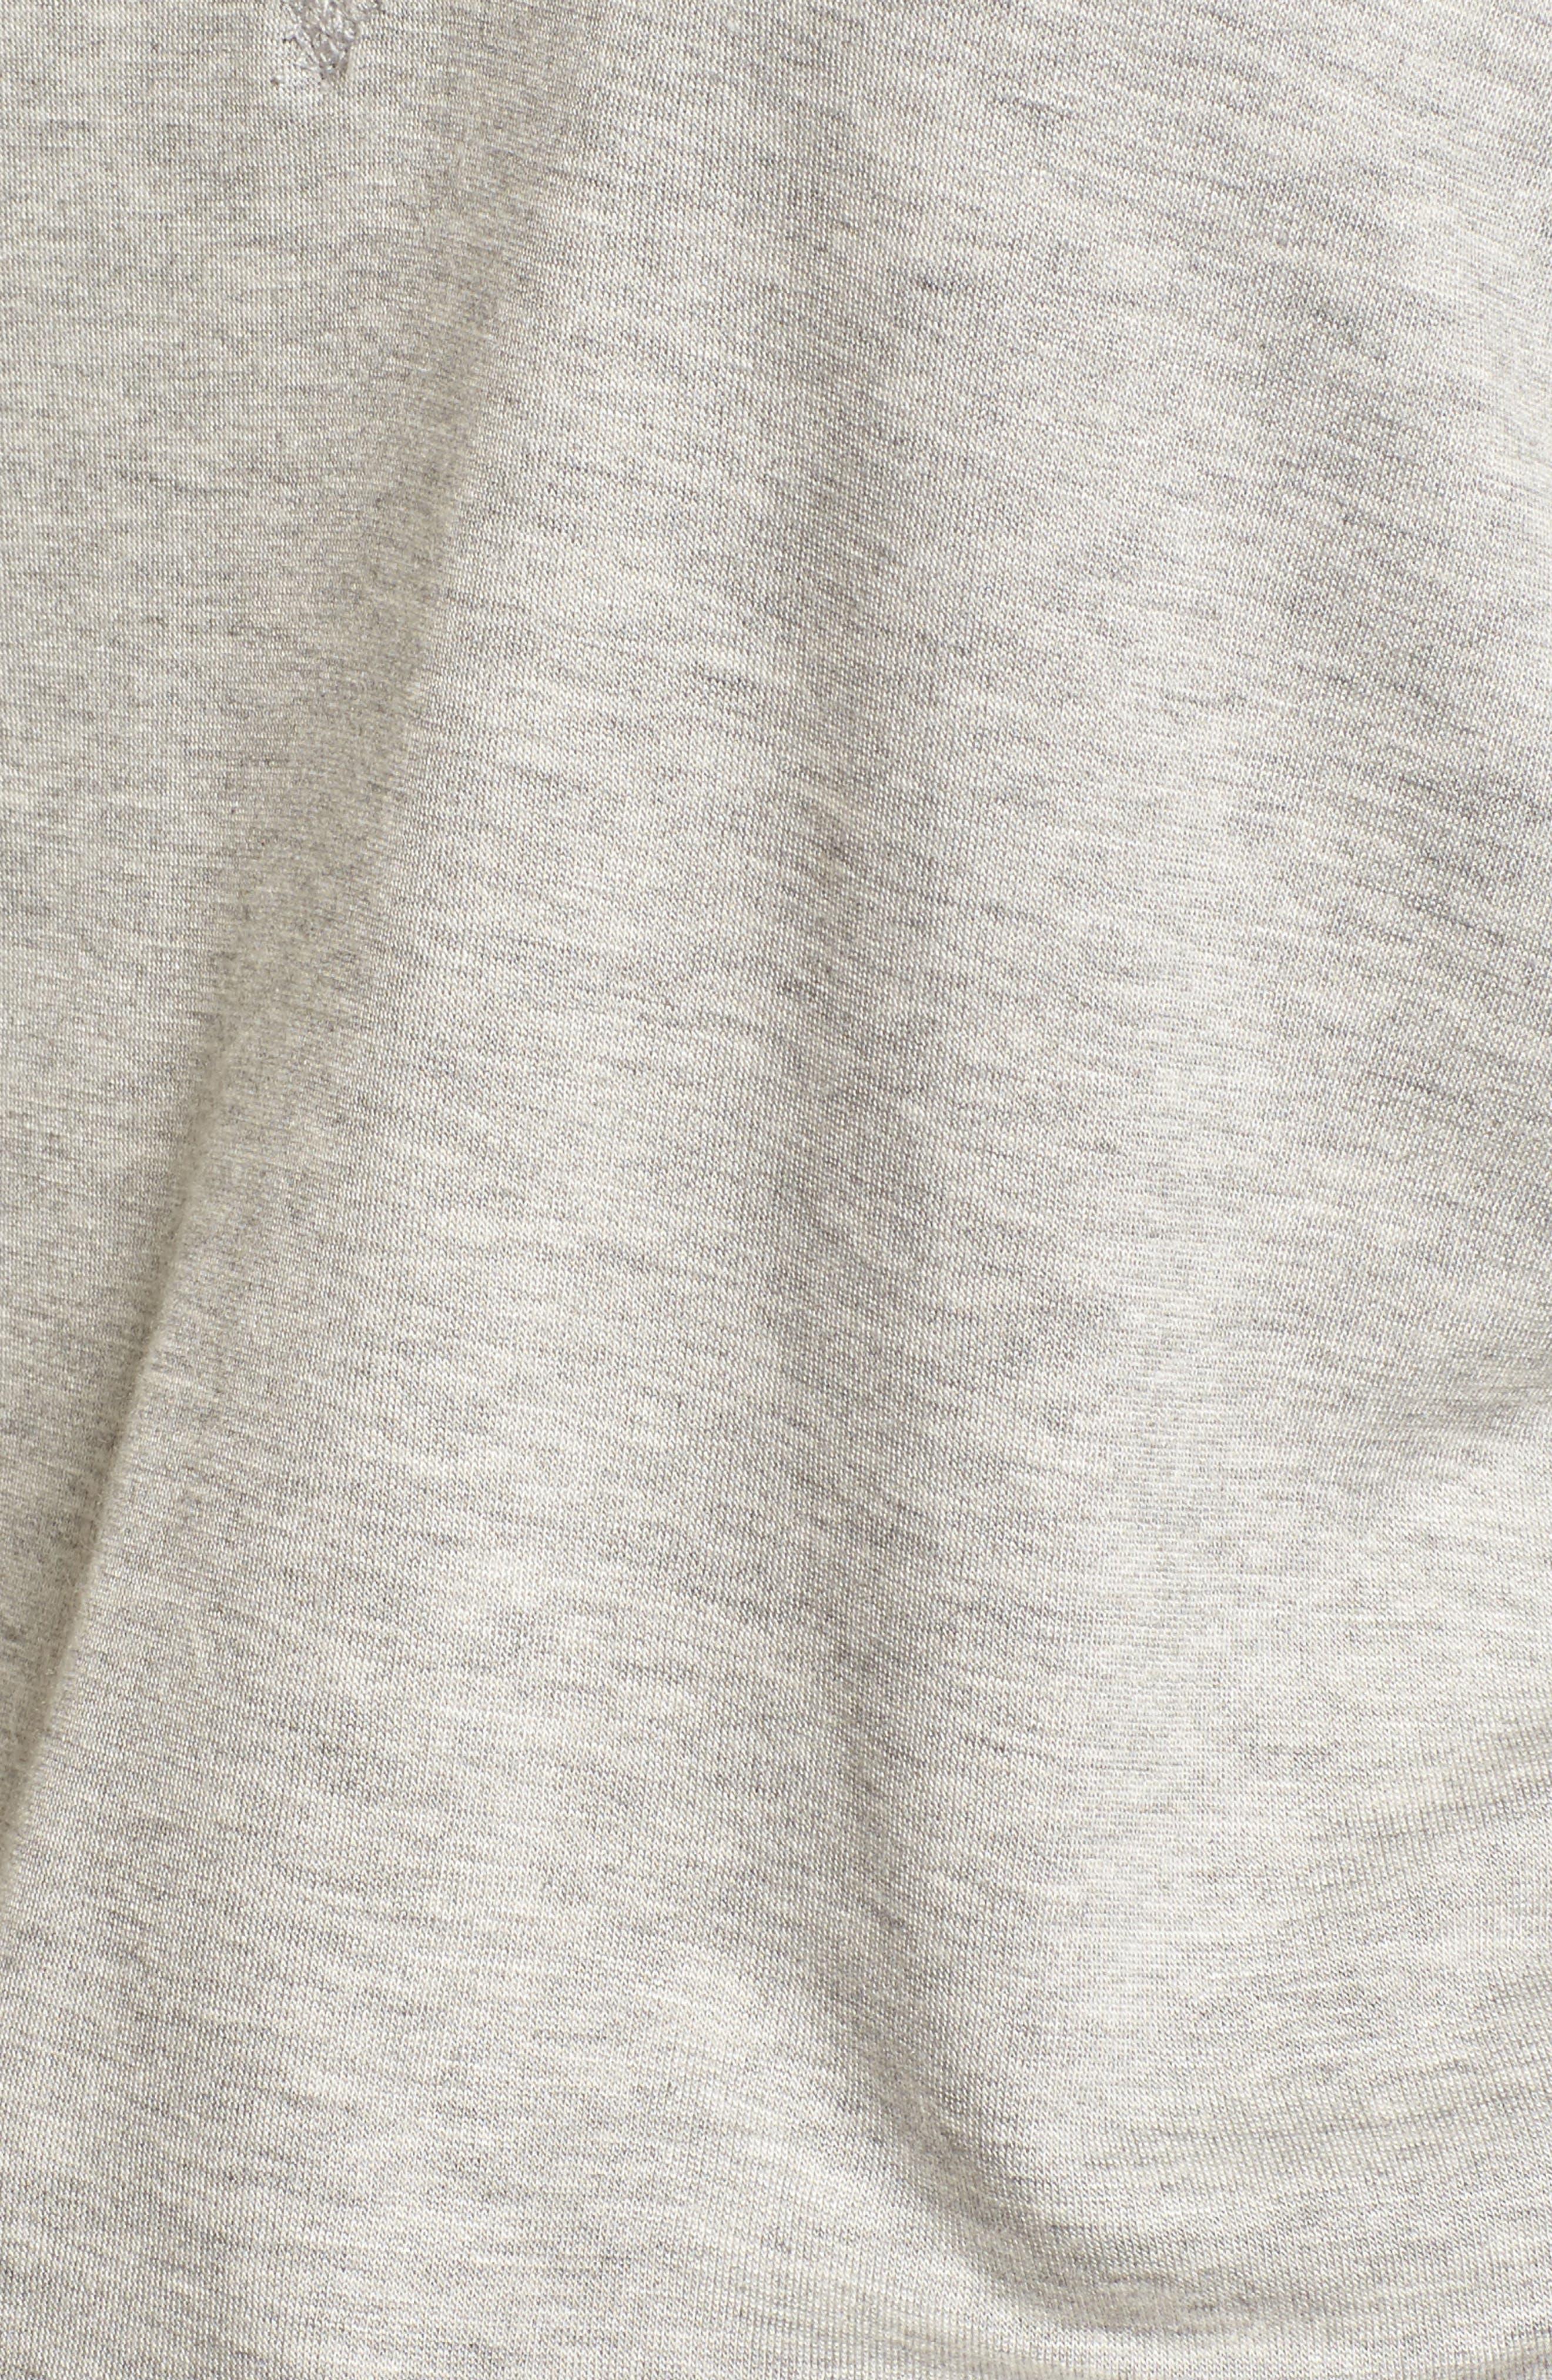 Thumbhole Cuff Sweater,                             Alternate thumbnail 5, color,                             020